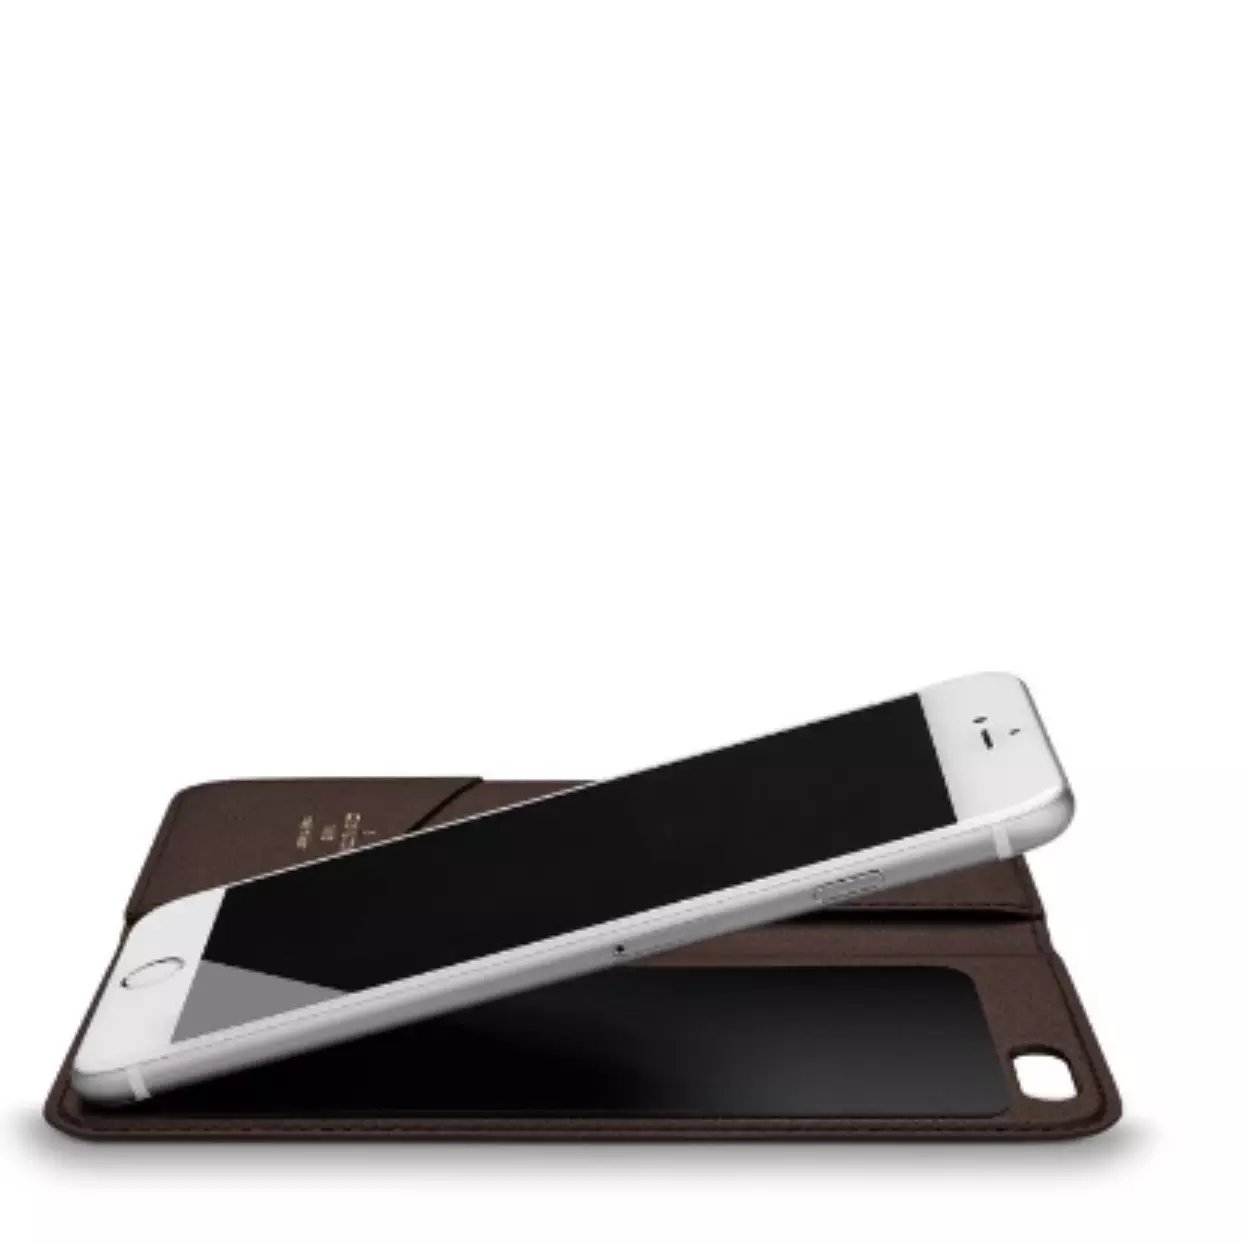 handyhülle iphone selbst gestalten iphone hülle mit foto bedrucken Louis Vuitton iphone7 hülle freitag handyhülle iphone 7 handyhülle htc one 7lbst gestalten iphone handytasche klapptasche iphone 7 iphone 7 holzhülle iphone 7 lederetui